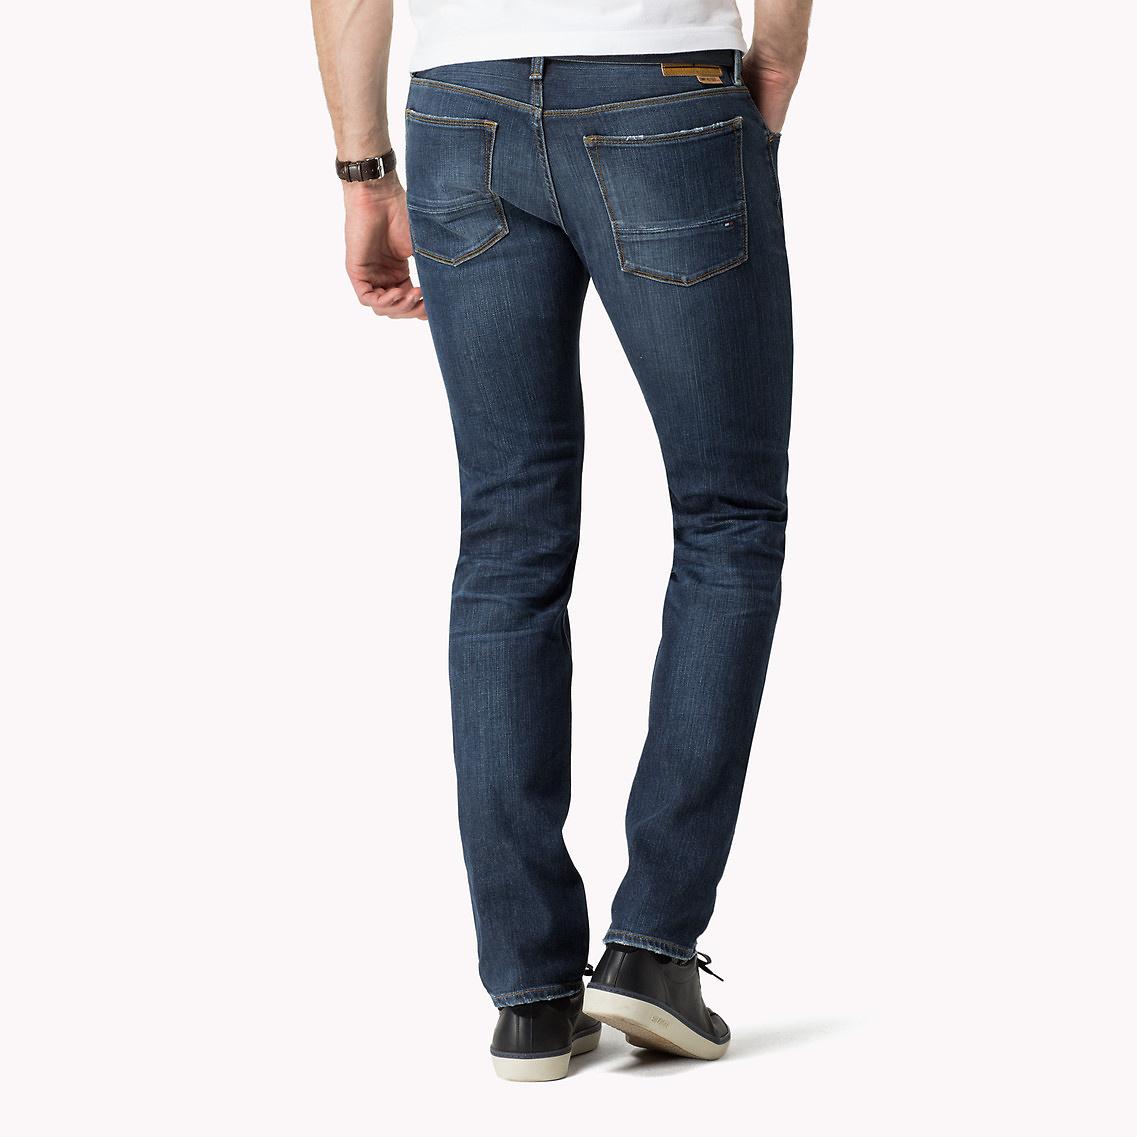 72e82327 Tommy Hilfiger Slim Fit Jeans in Blue for Men - Lyst